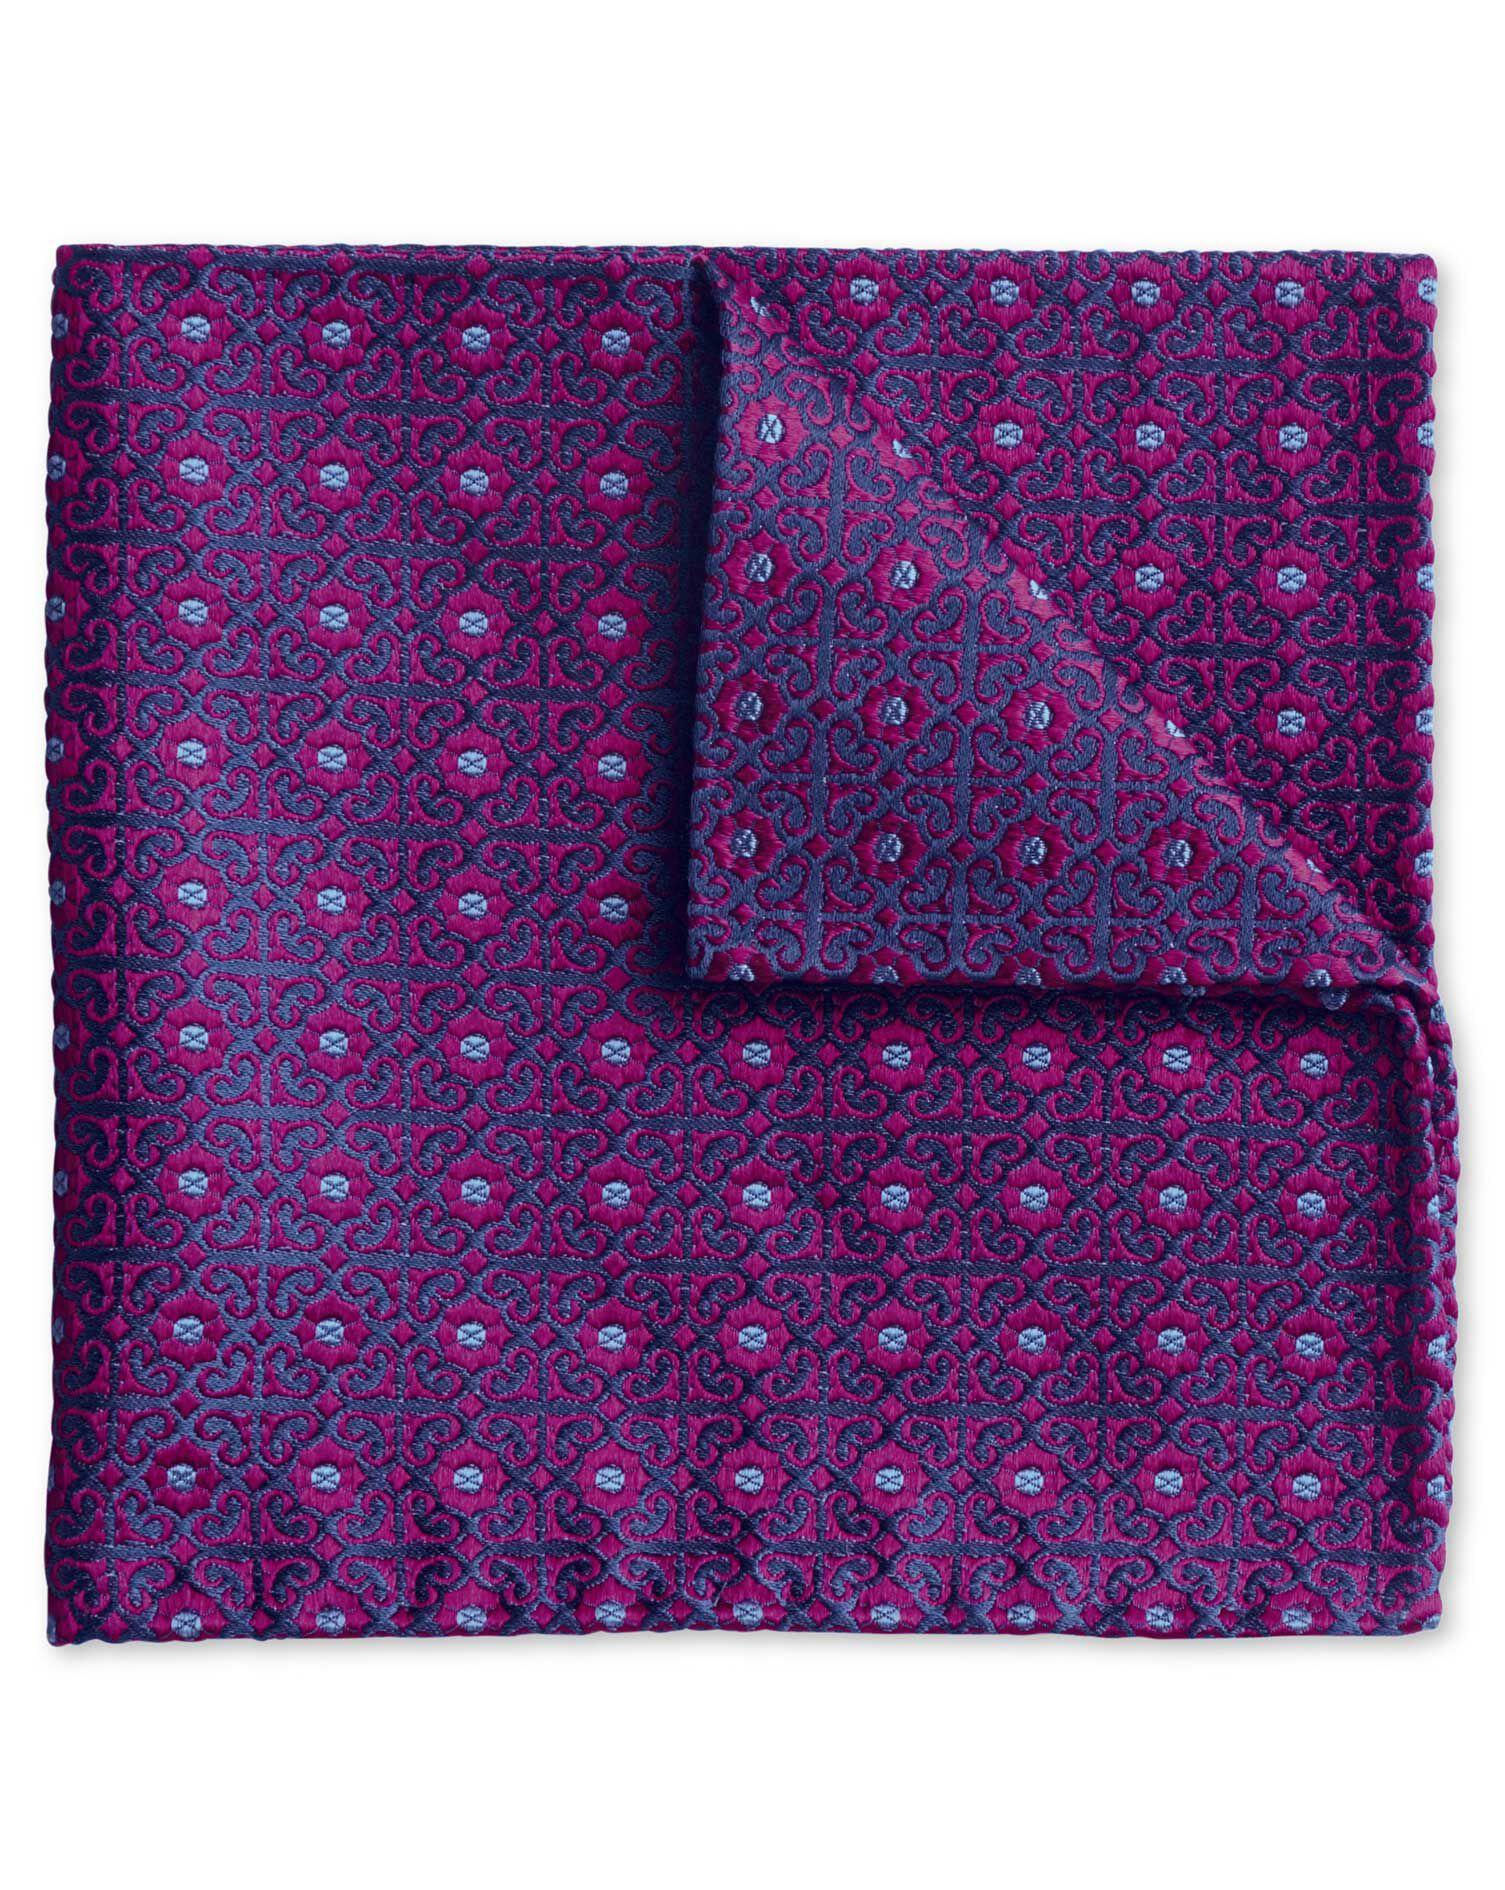 Magenta Geometric English Luxury Silk Pocket Square Size OSFA by Charles Tyrwhitt